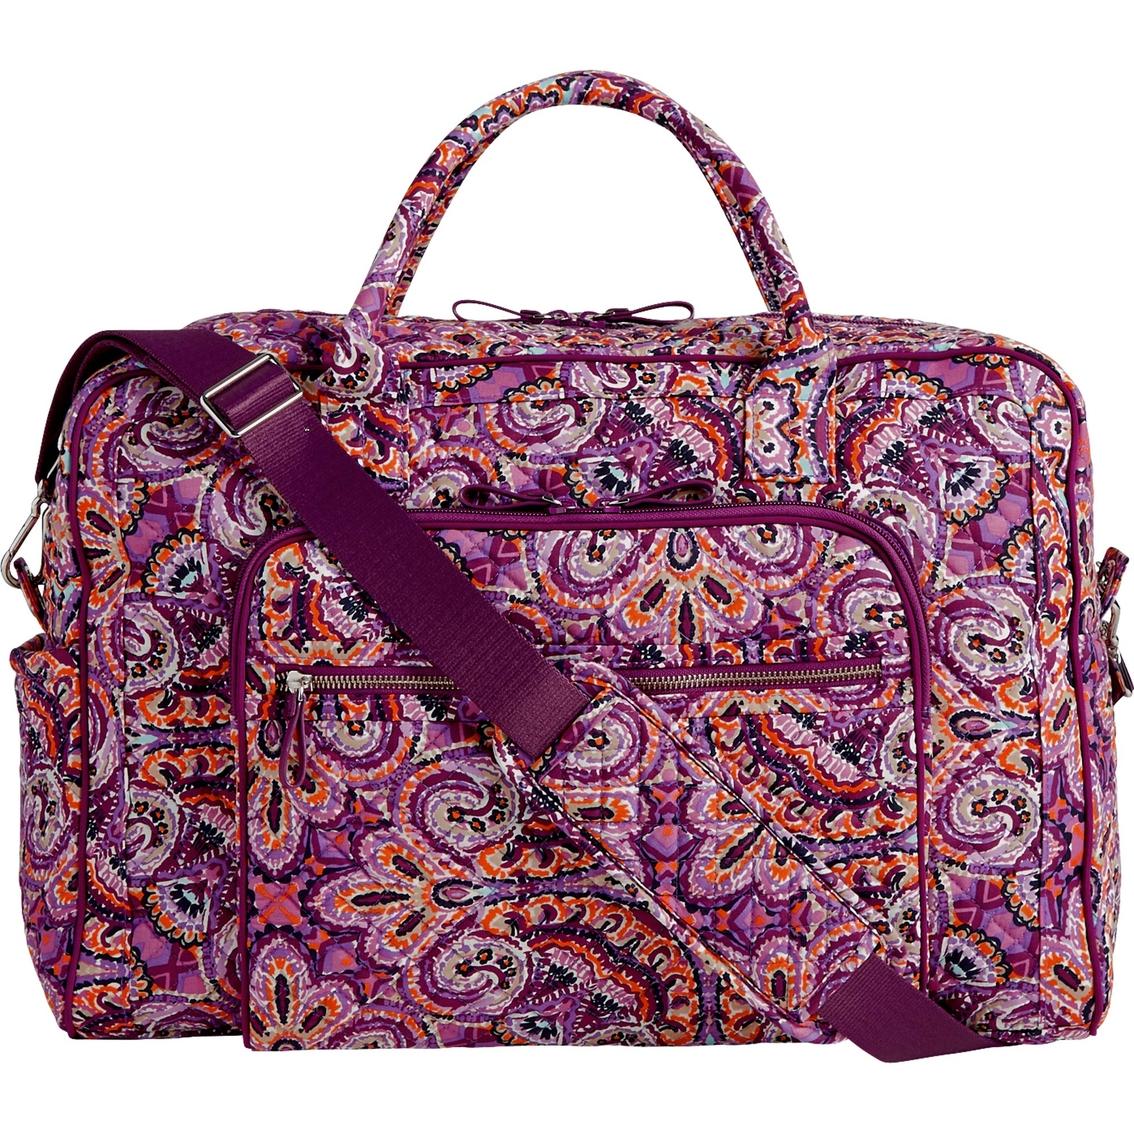 Vera Bradley Iconic Weekender Travel Bag 153a1cfb9fb9c